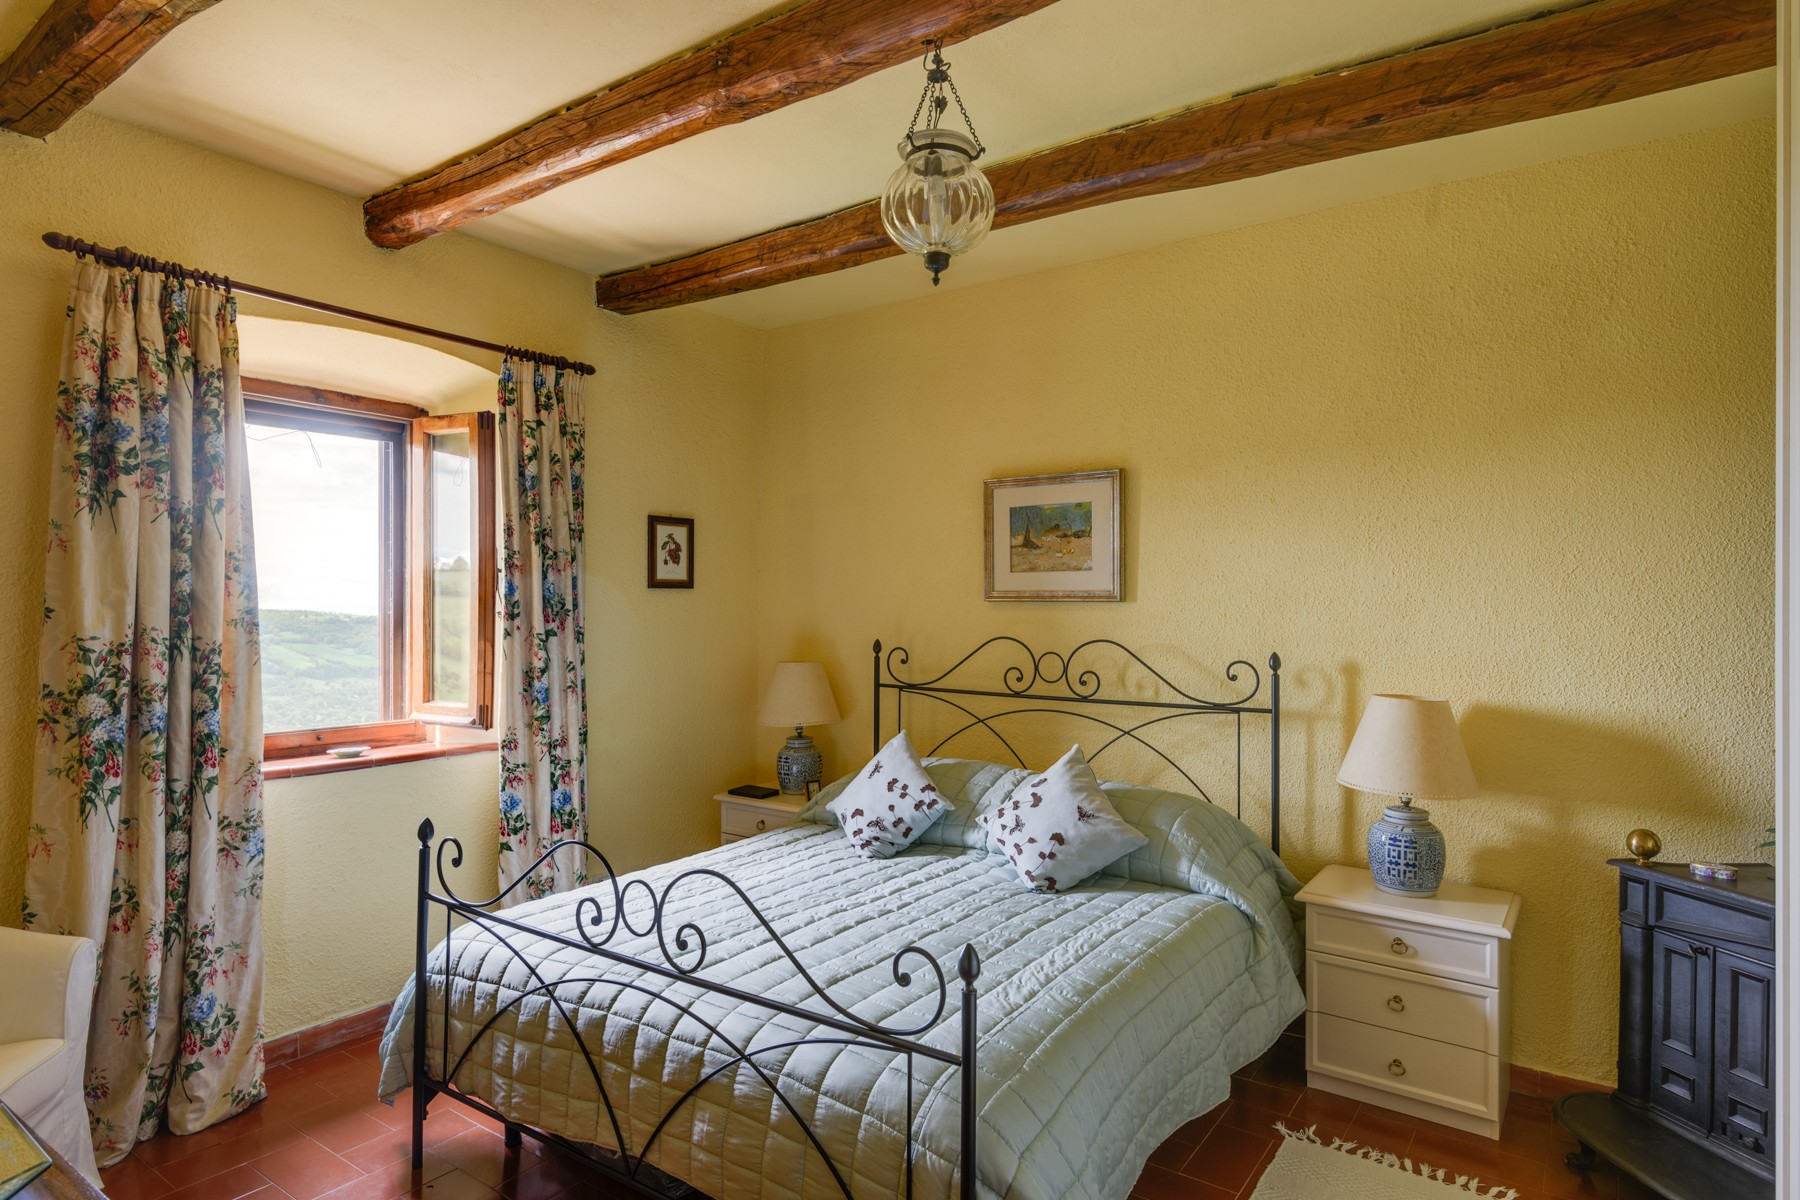 Casa indipendente in Vendita a Semproniano: 4 locali, 220 mq - Foto 16